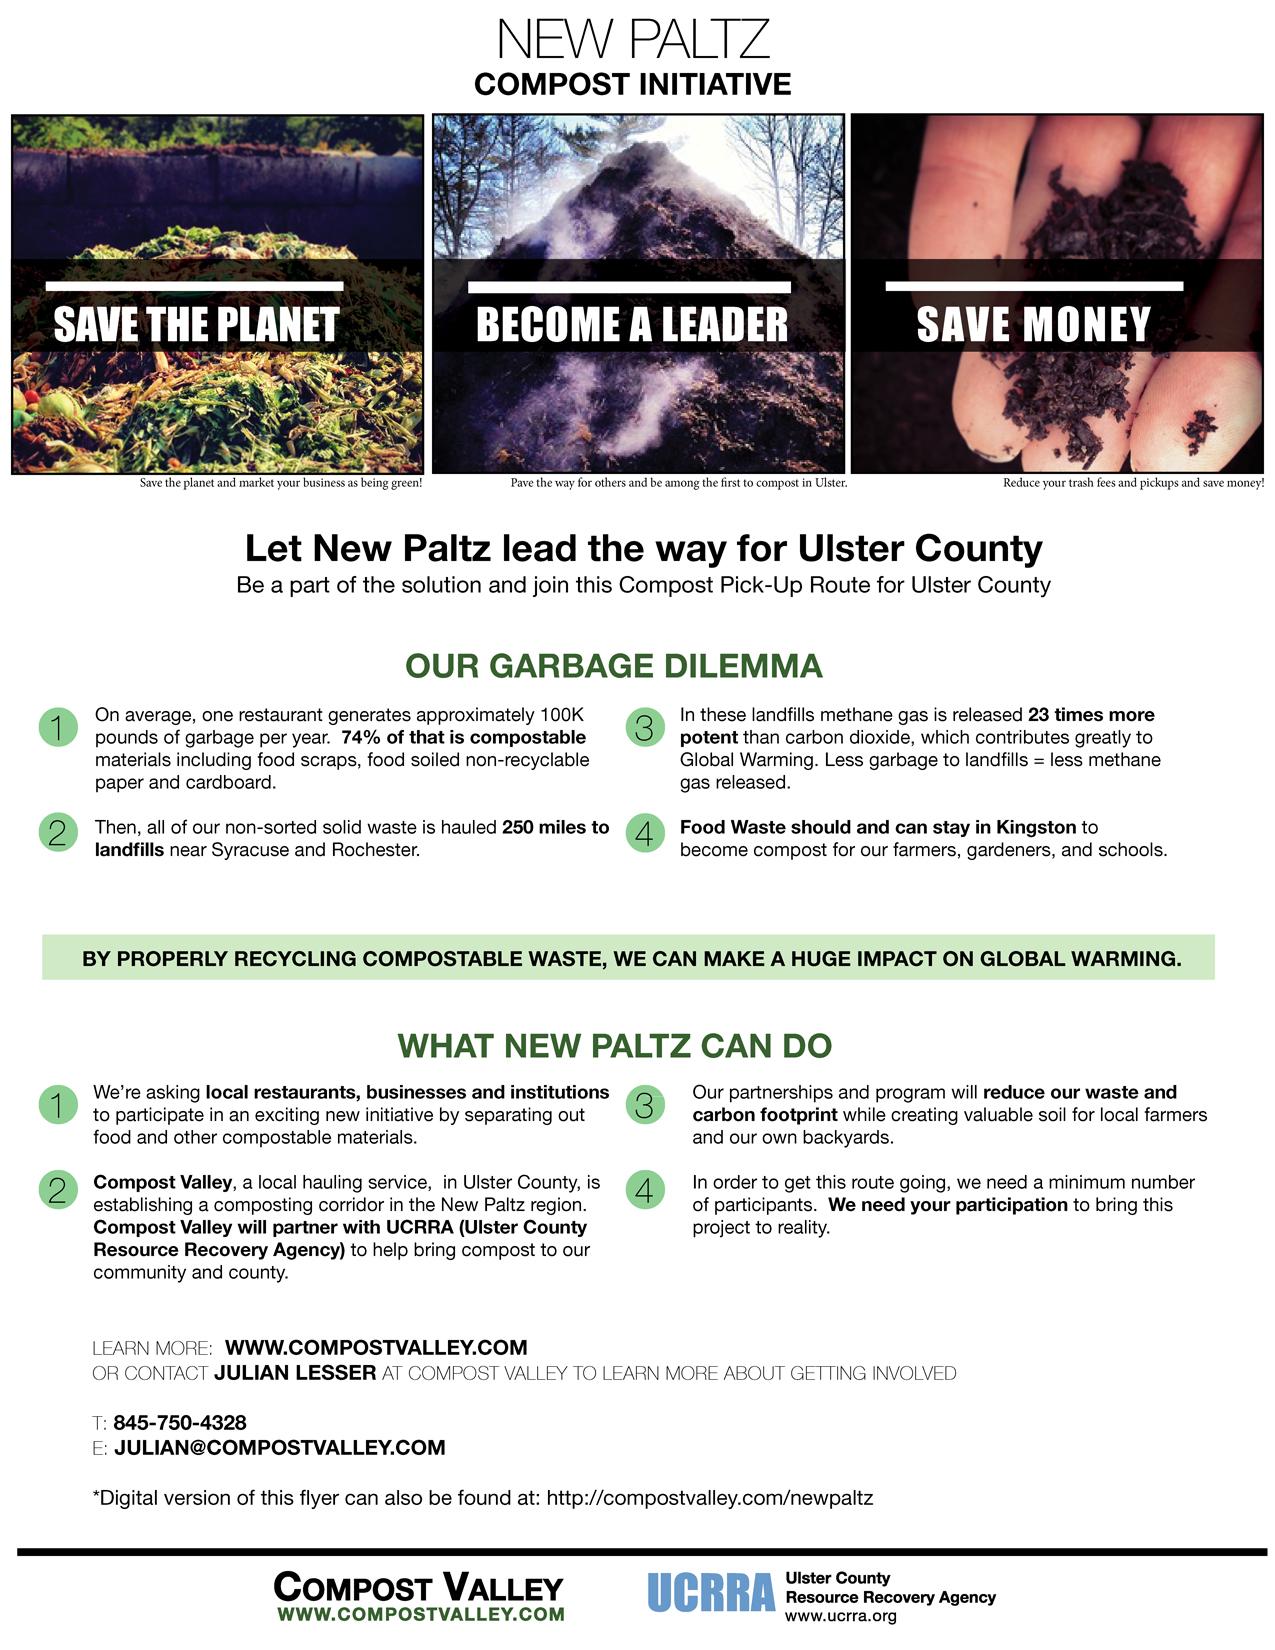 newpaltz-compost-flyer.jpg